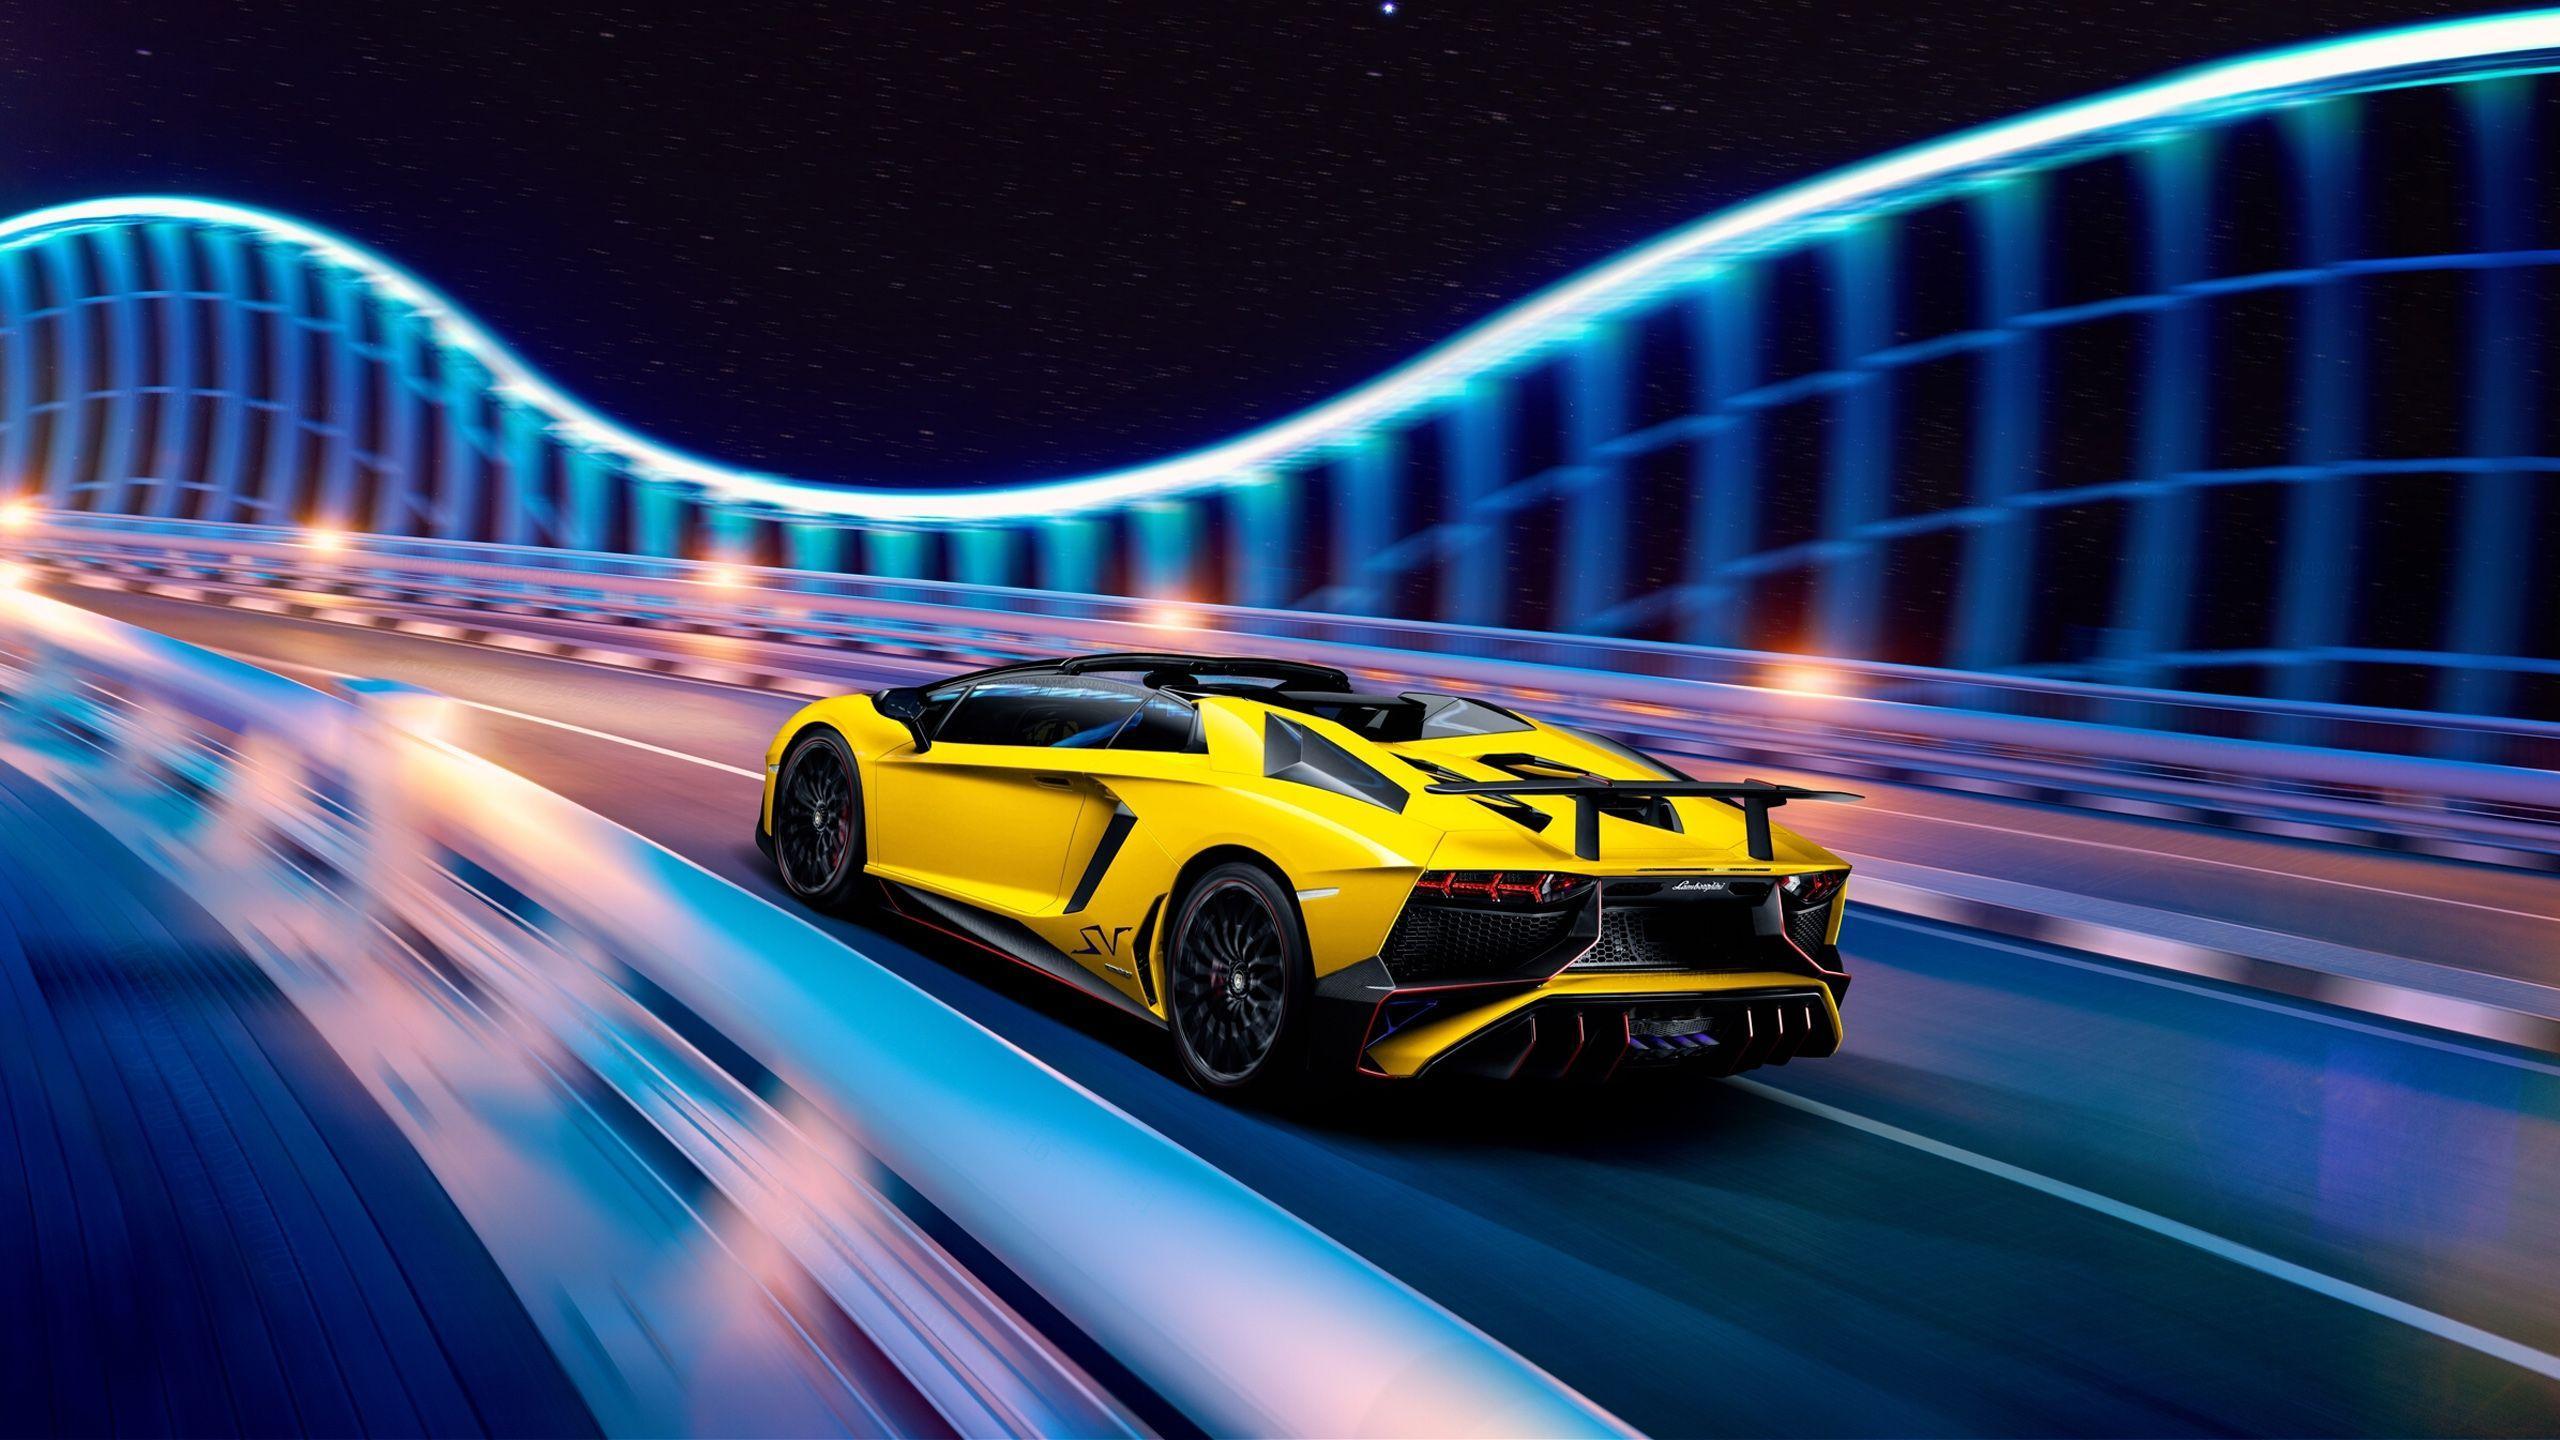 Neon Lamborghini Wallpapers - Top Free Neon Lamborghini ...